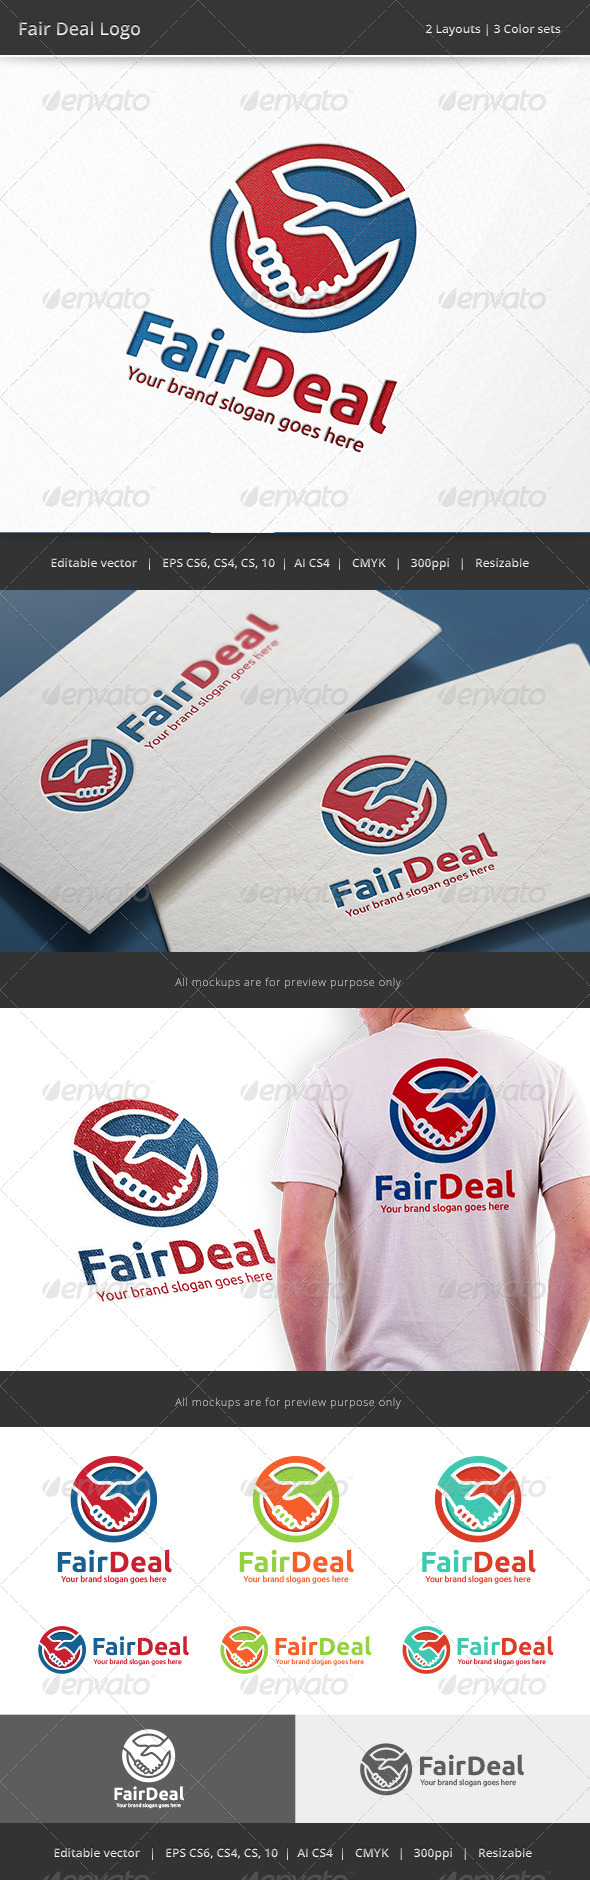 GraphicRiver Fair Deal Logo 8595703